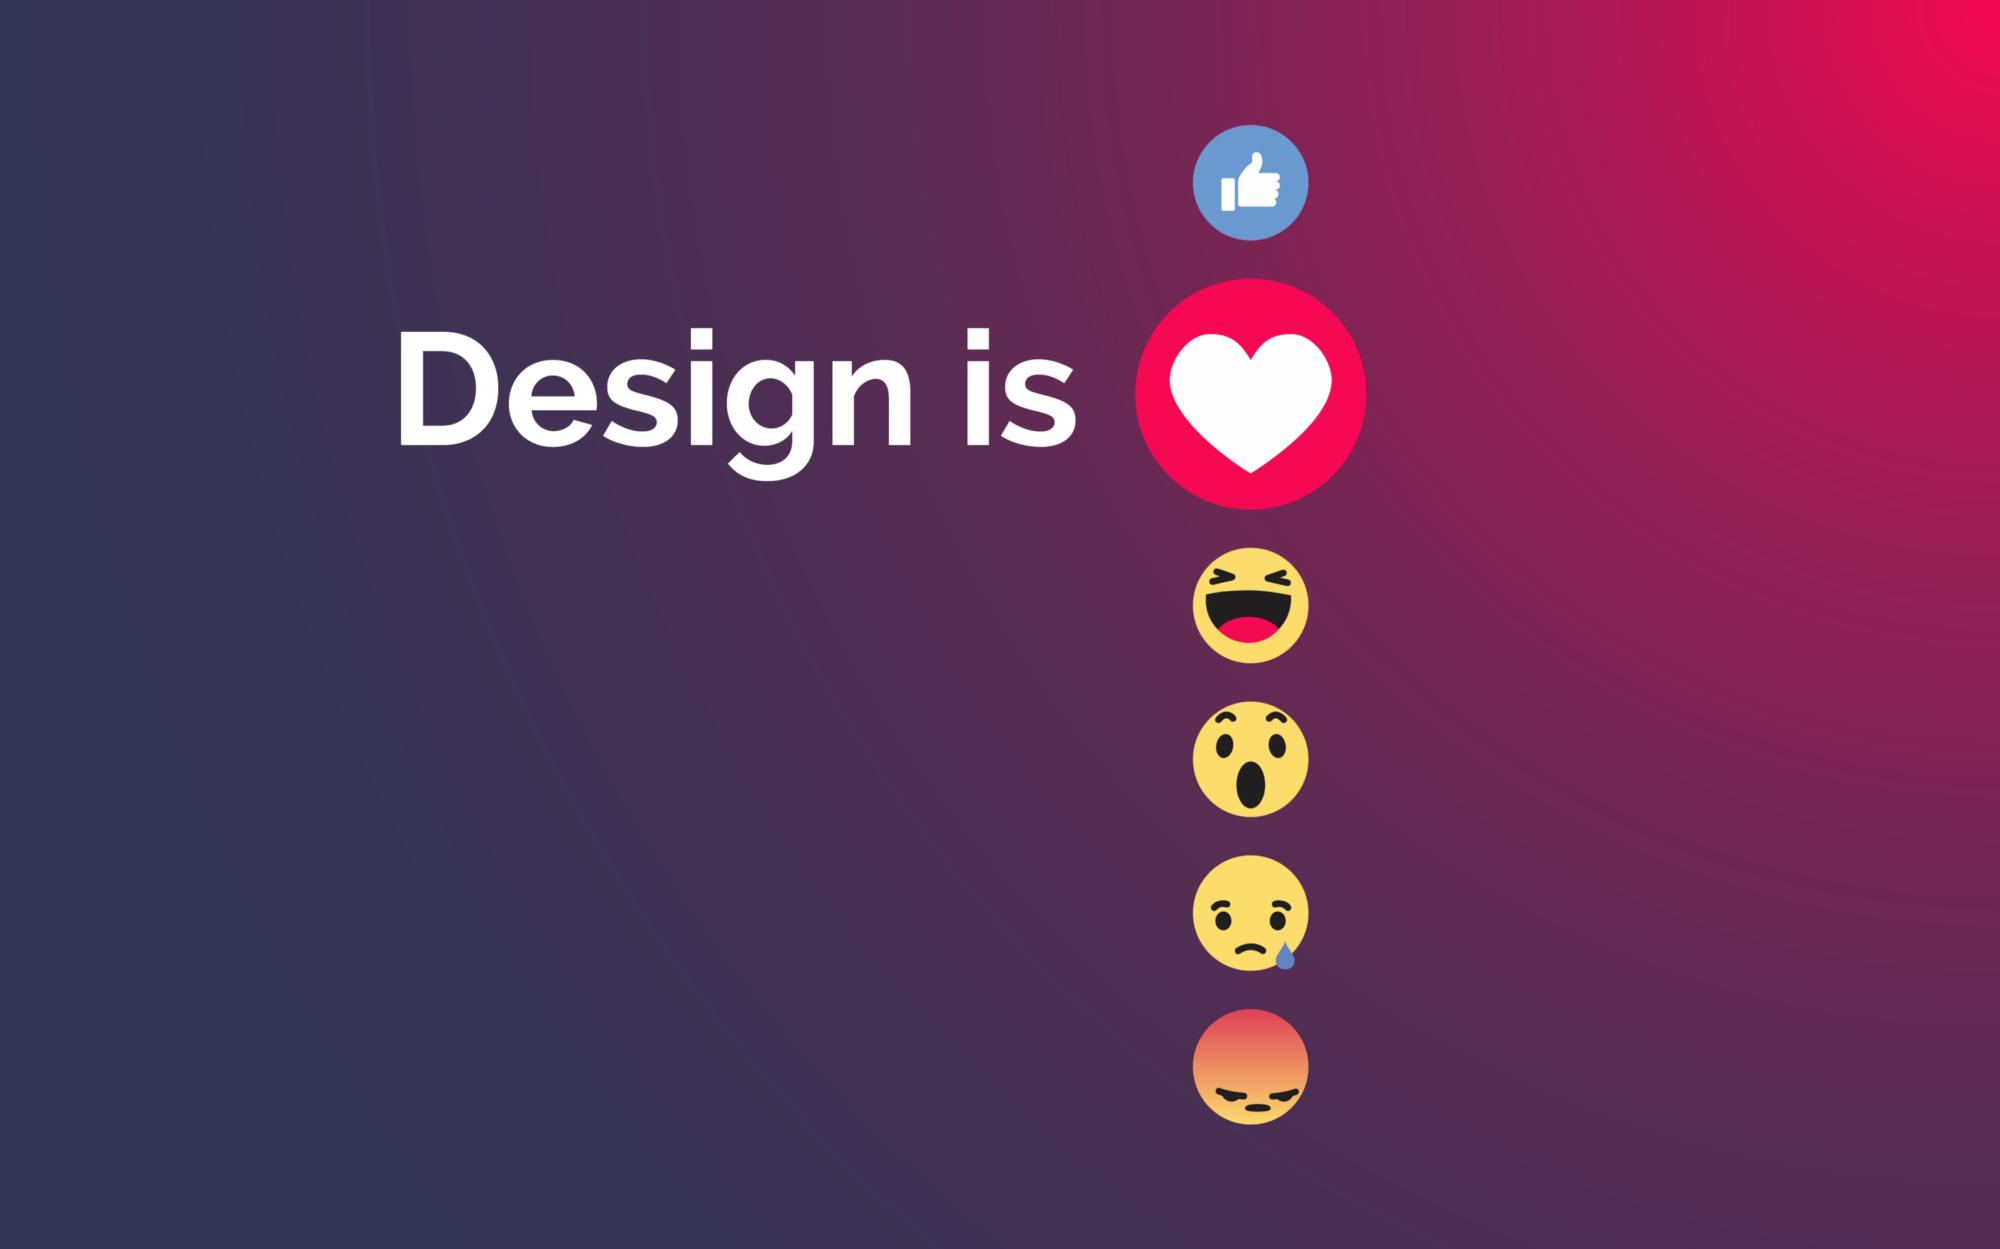 09 - mikroalilepidraseis neas xronias web design